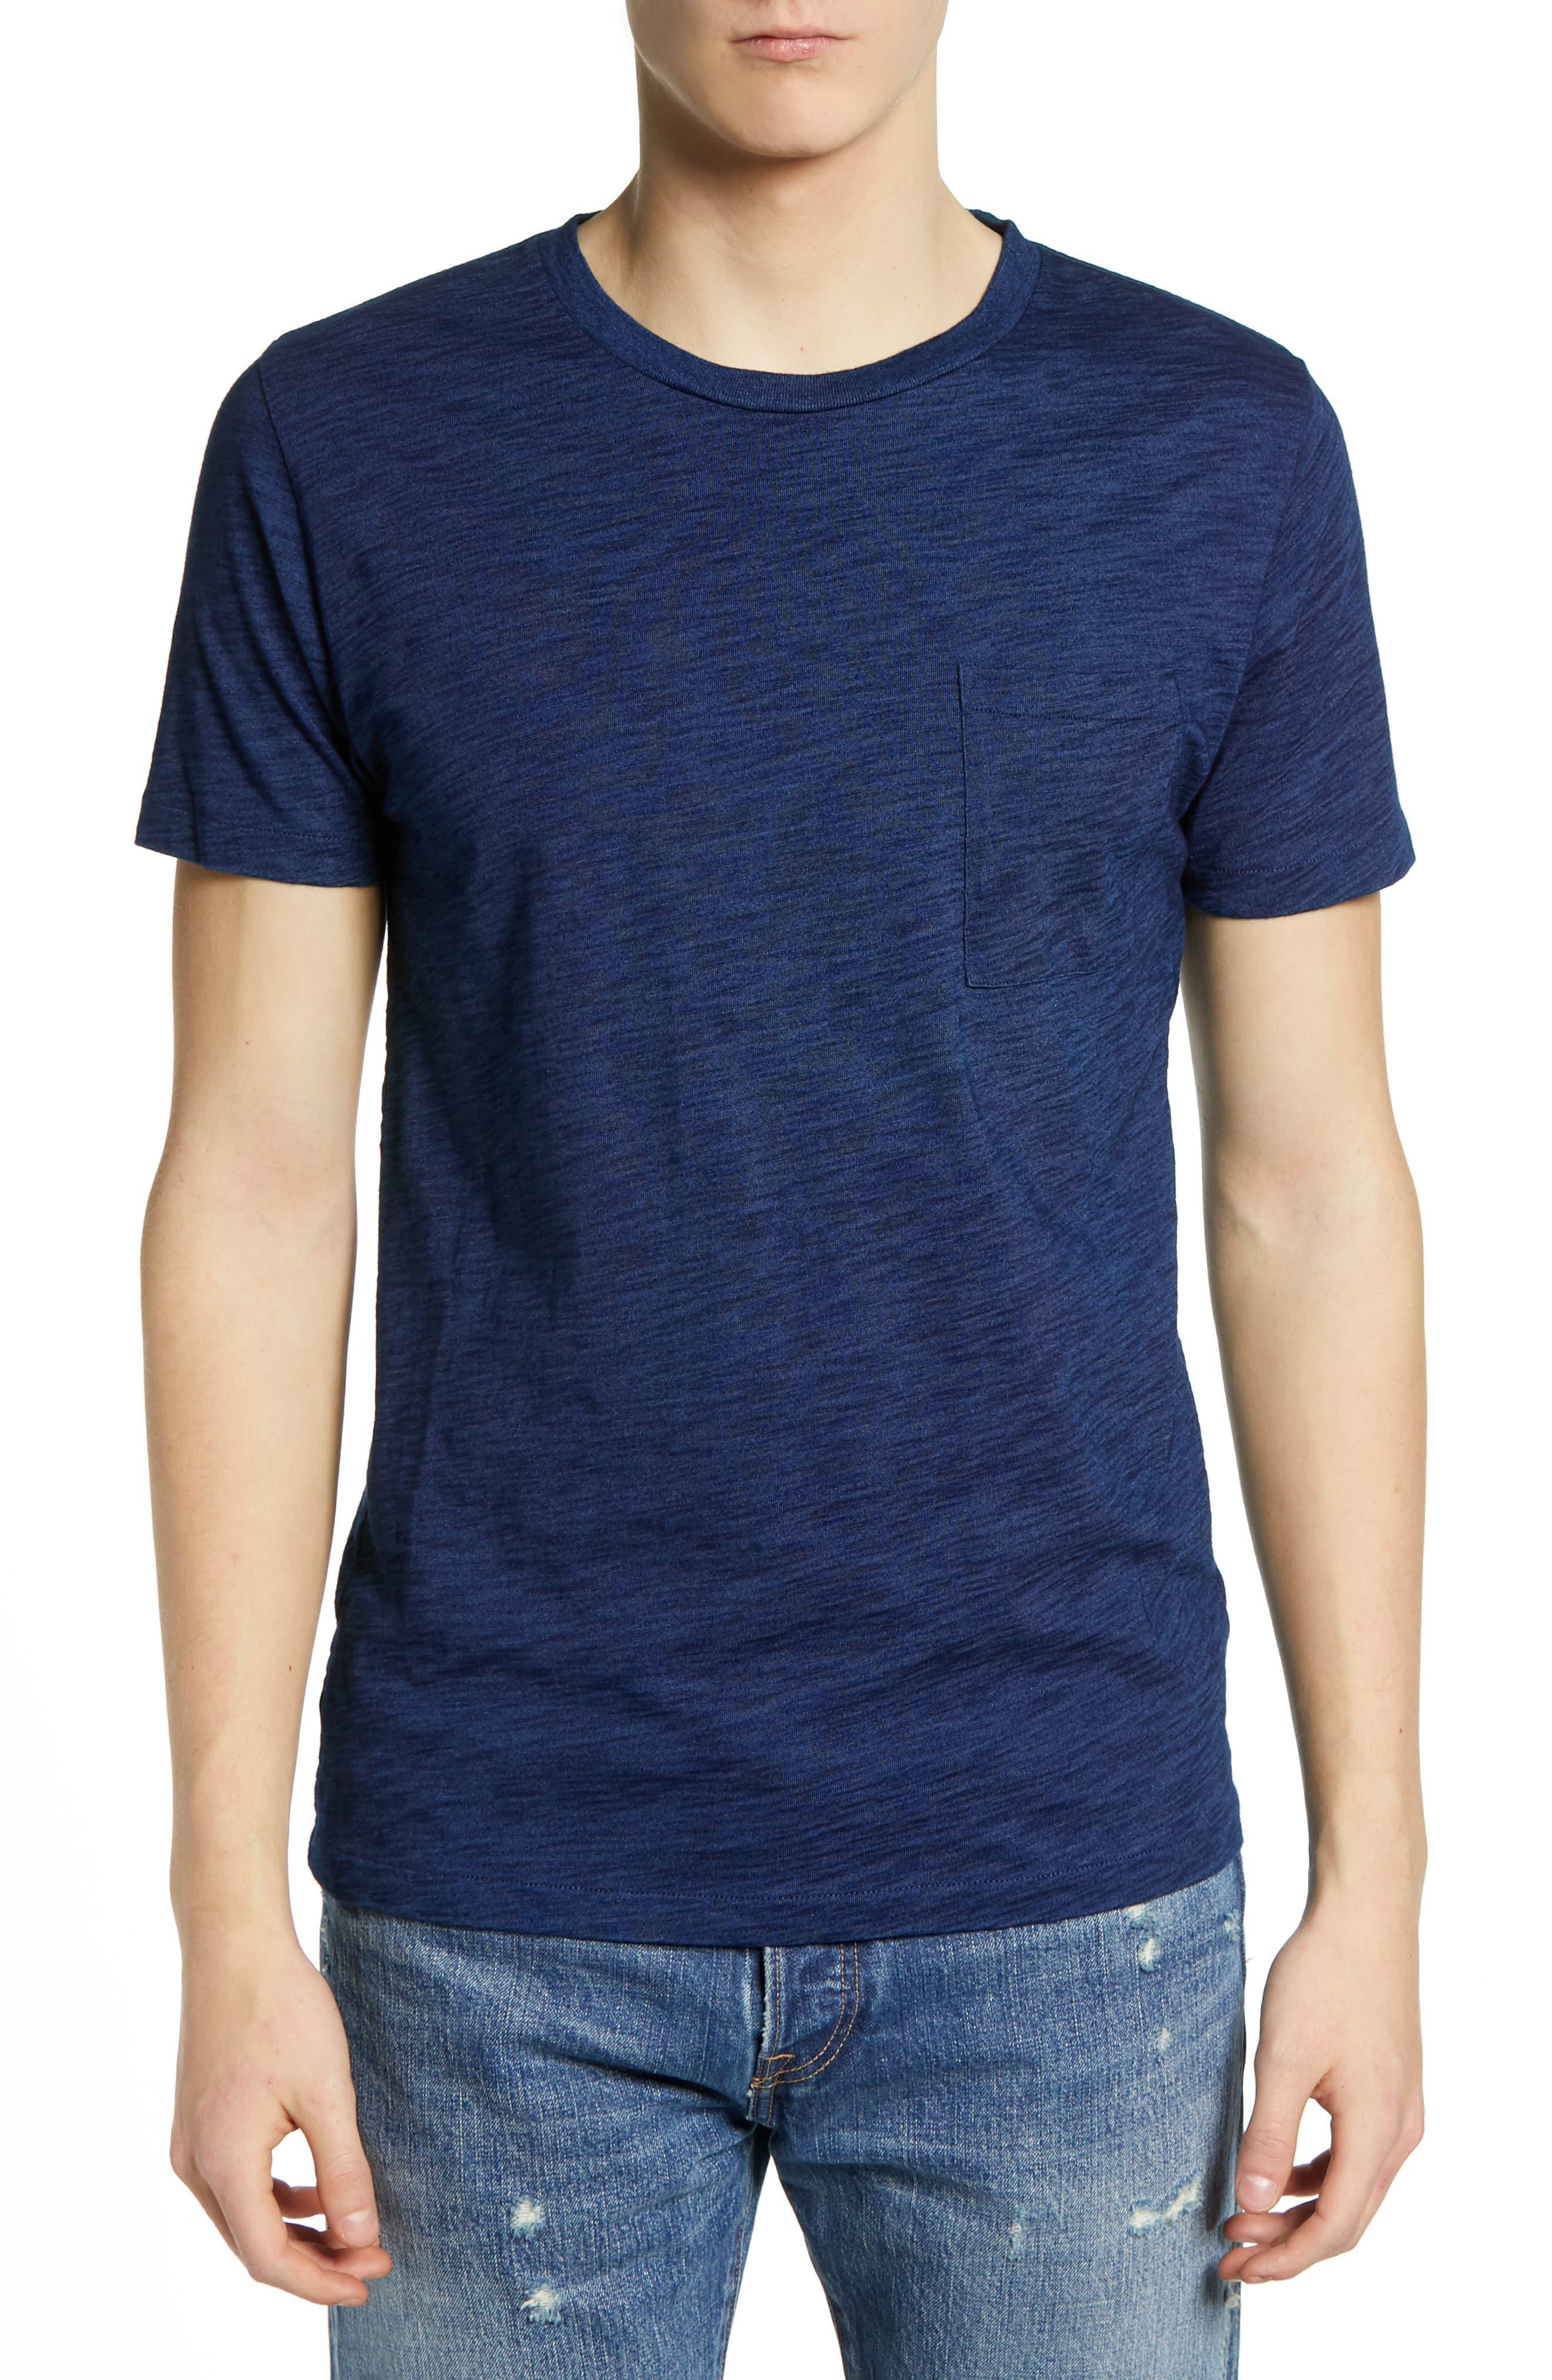 LEVI'S<SUP>®</SUP> MADE & CRAFTED<SUP>™</SUP>, Pocket T-Shirt, Main thumbnail 1, color, WASHED BLUE INDIGO